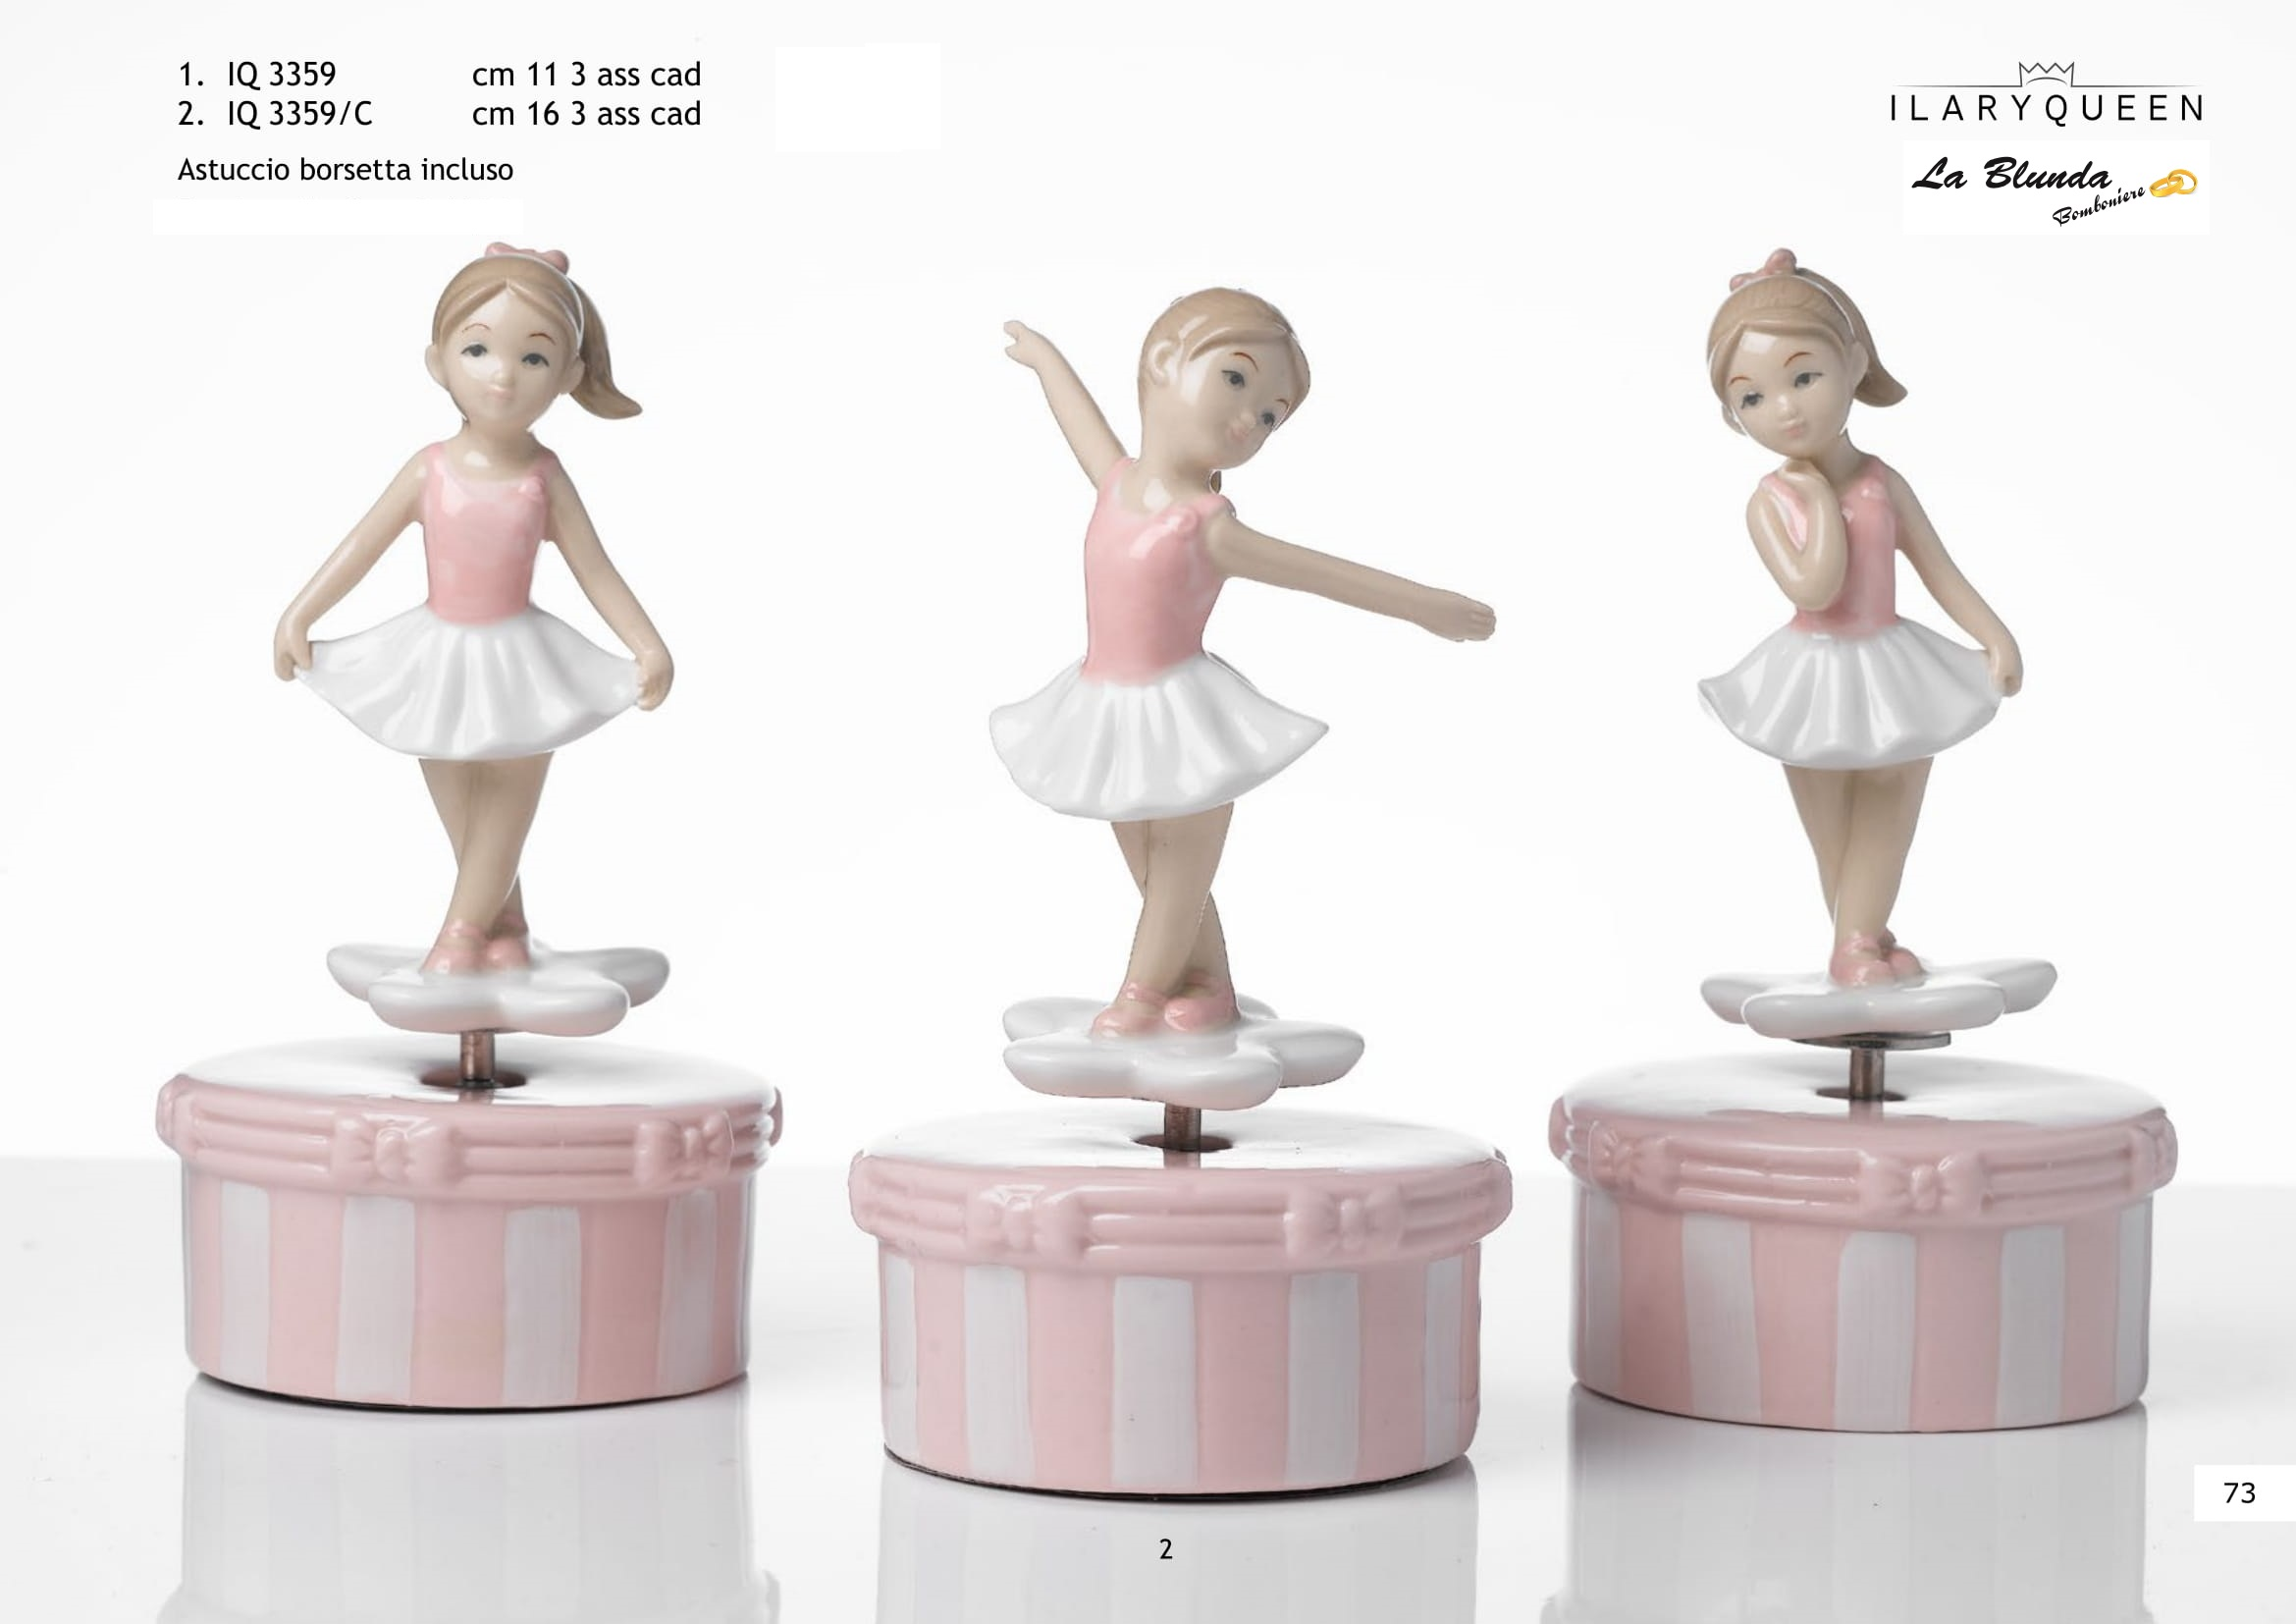 catalogo ilaryqueen 2020-073